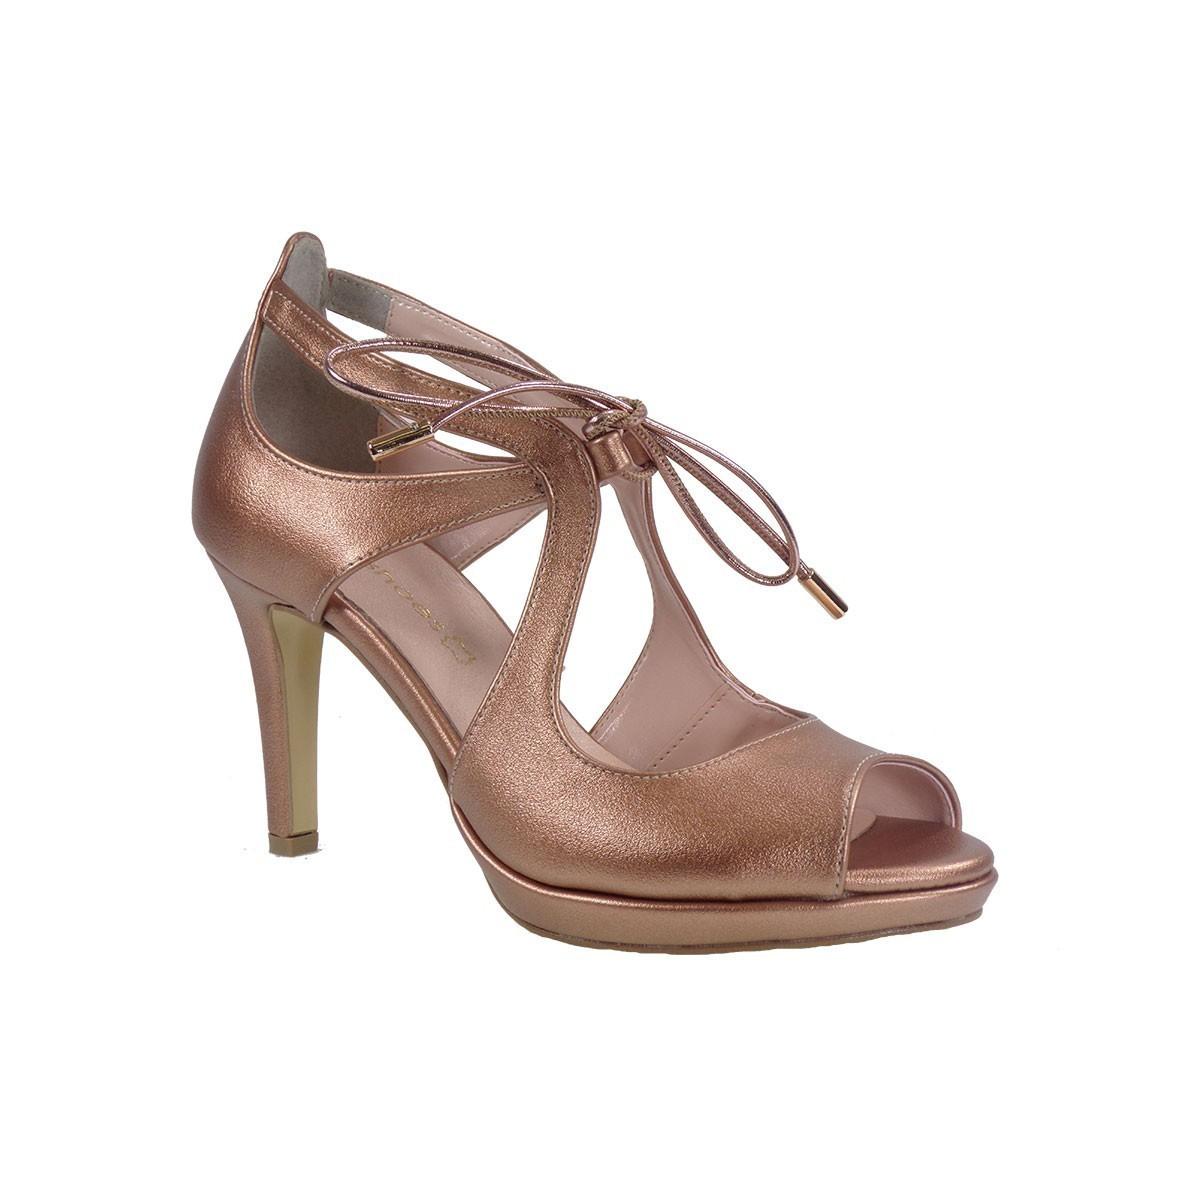 Katia Shoes Γυναικεία Παπούτσια Πέδιλα 74-4966 Χαλκός Ματ